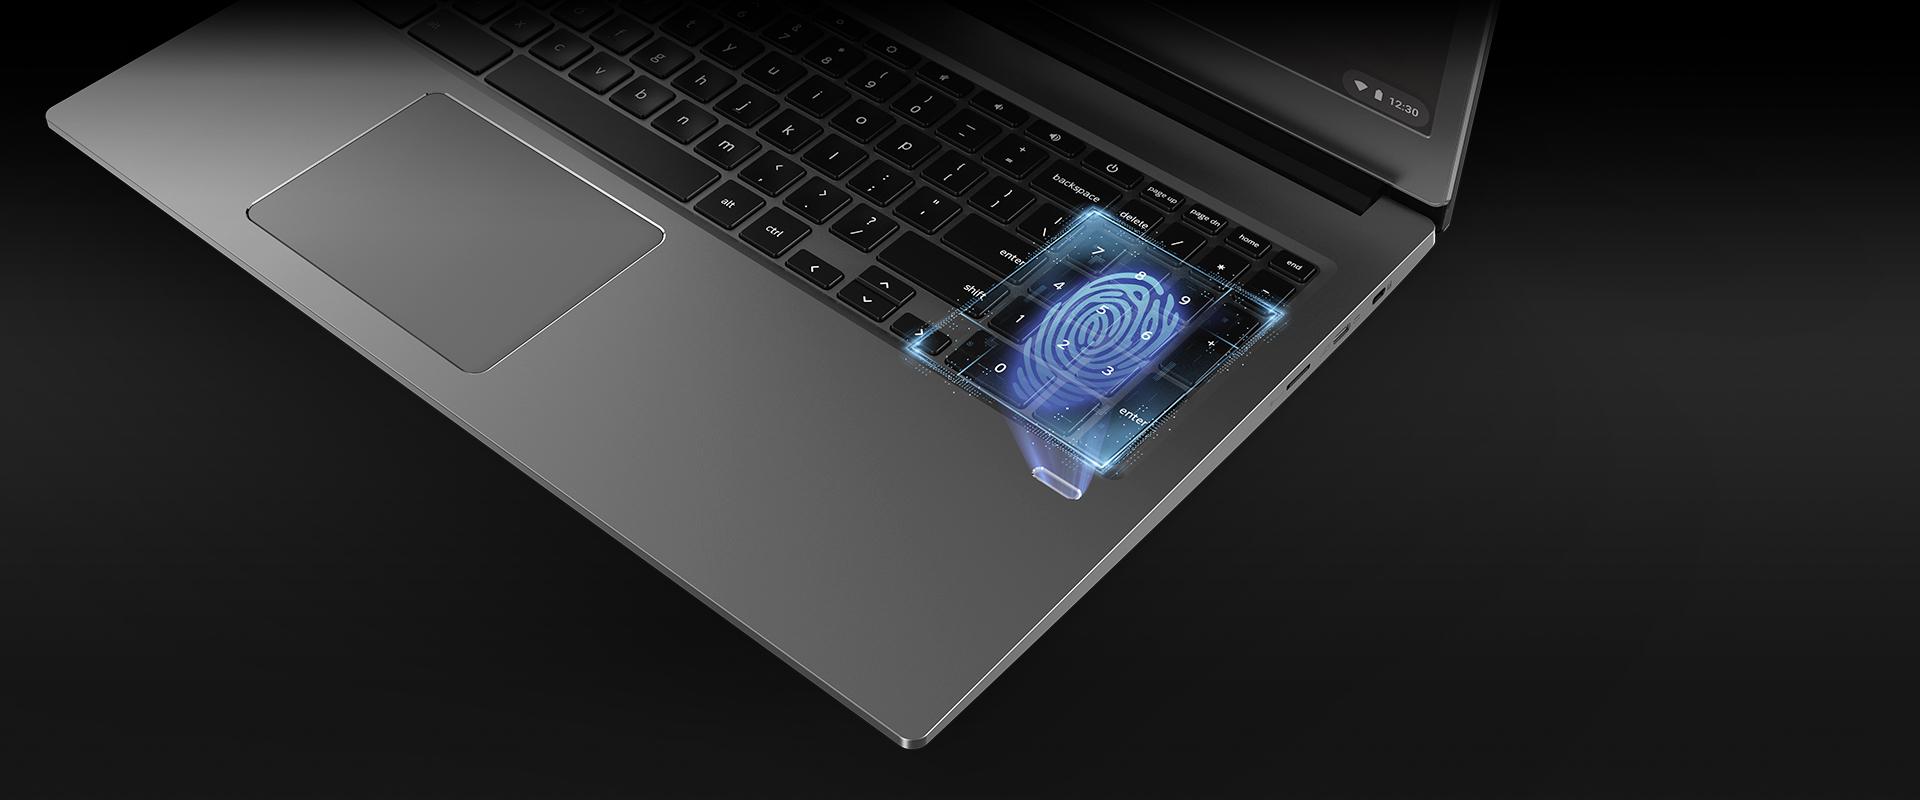 Acer Chromebook 715 - CB715 - First Fingerprint Reader  - Large